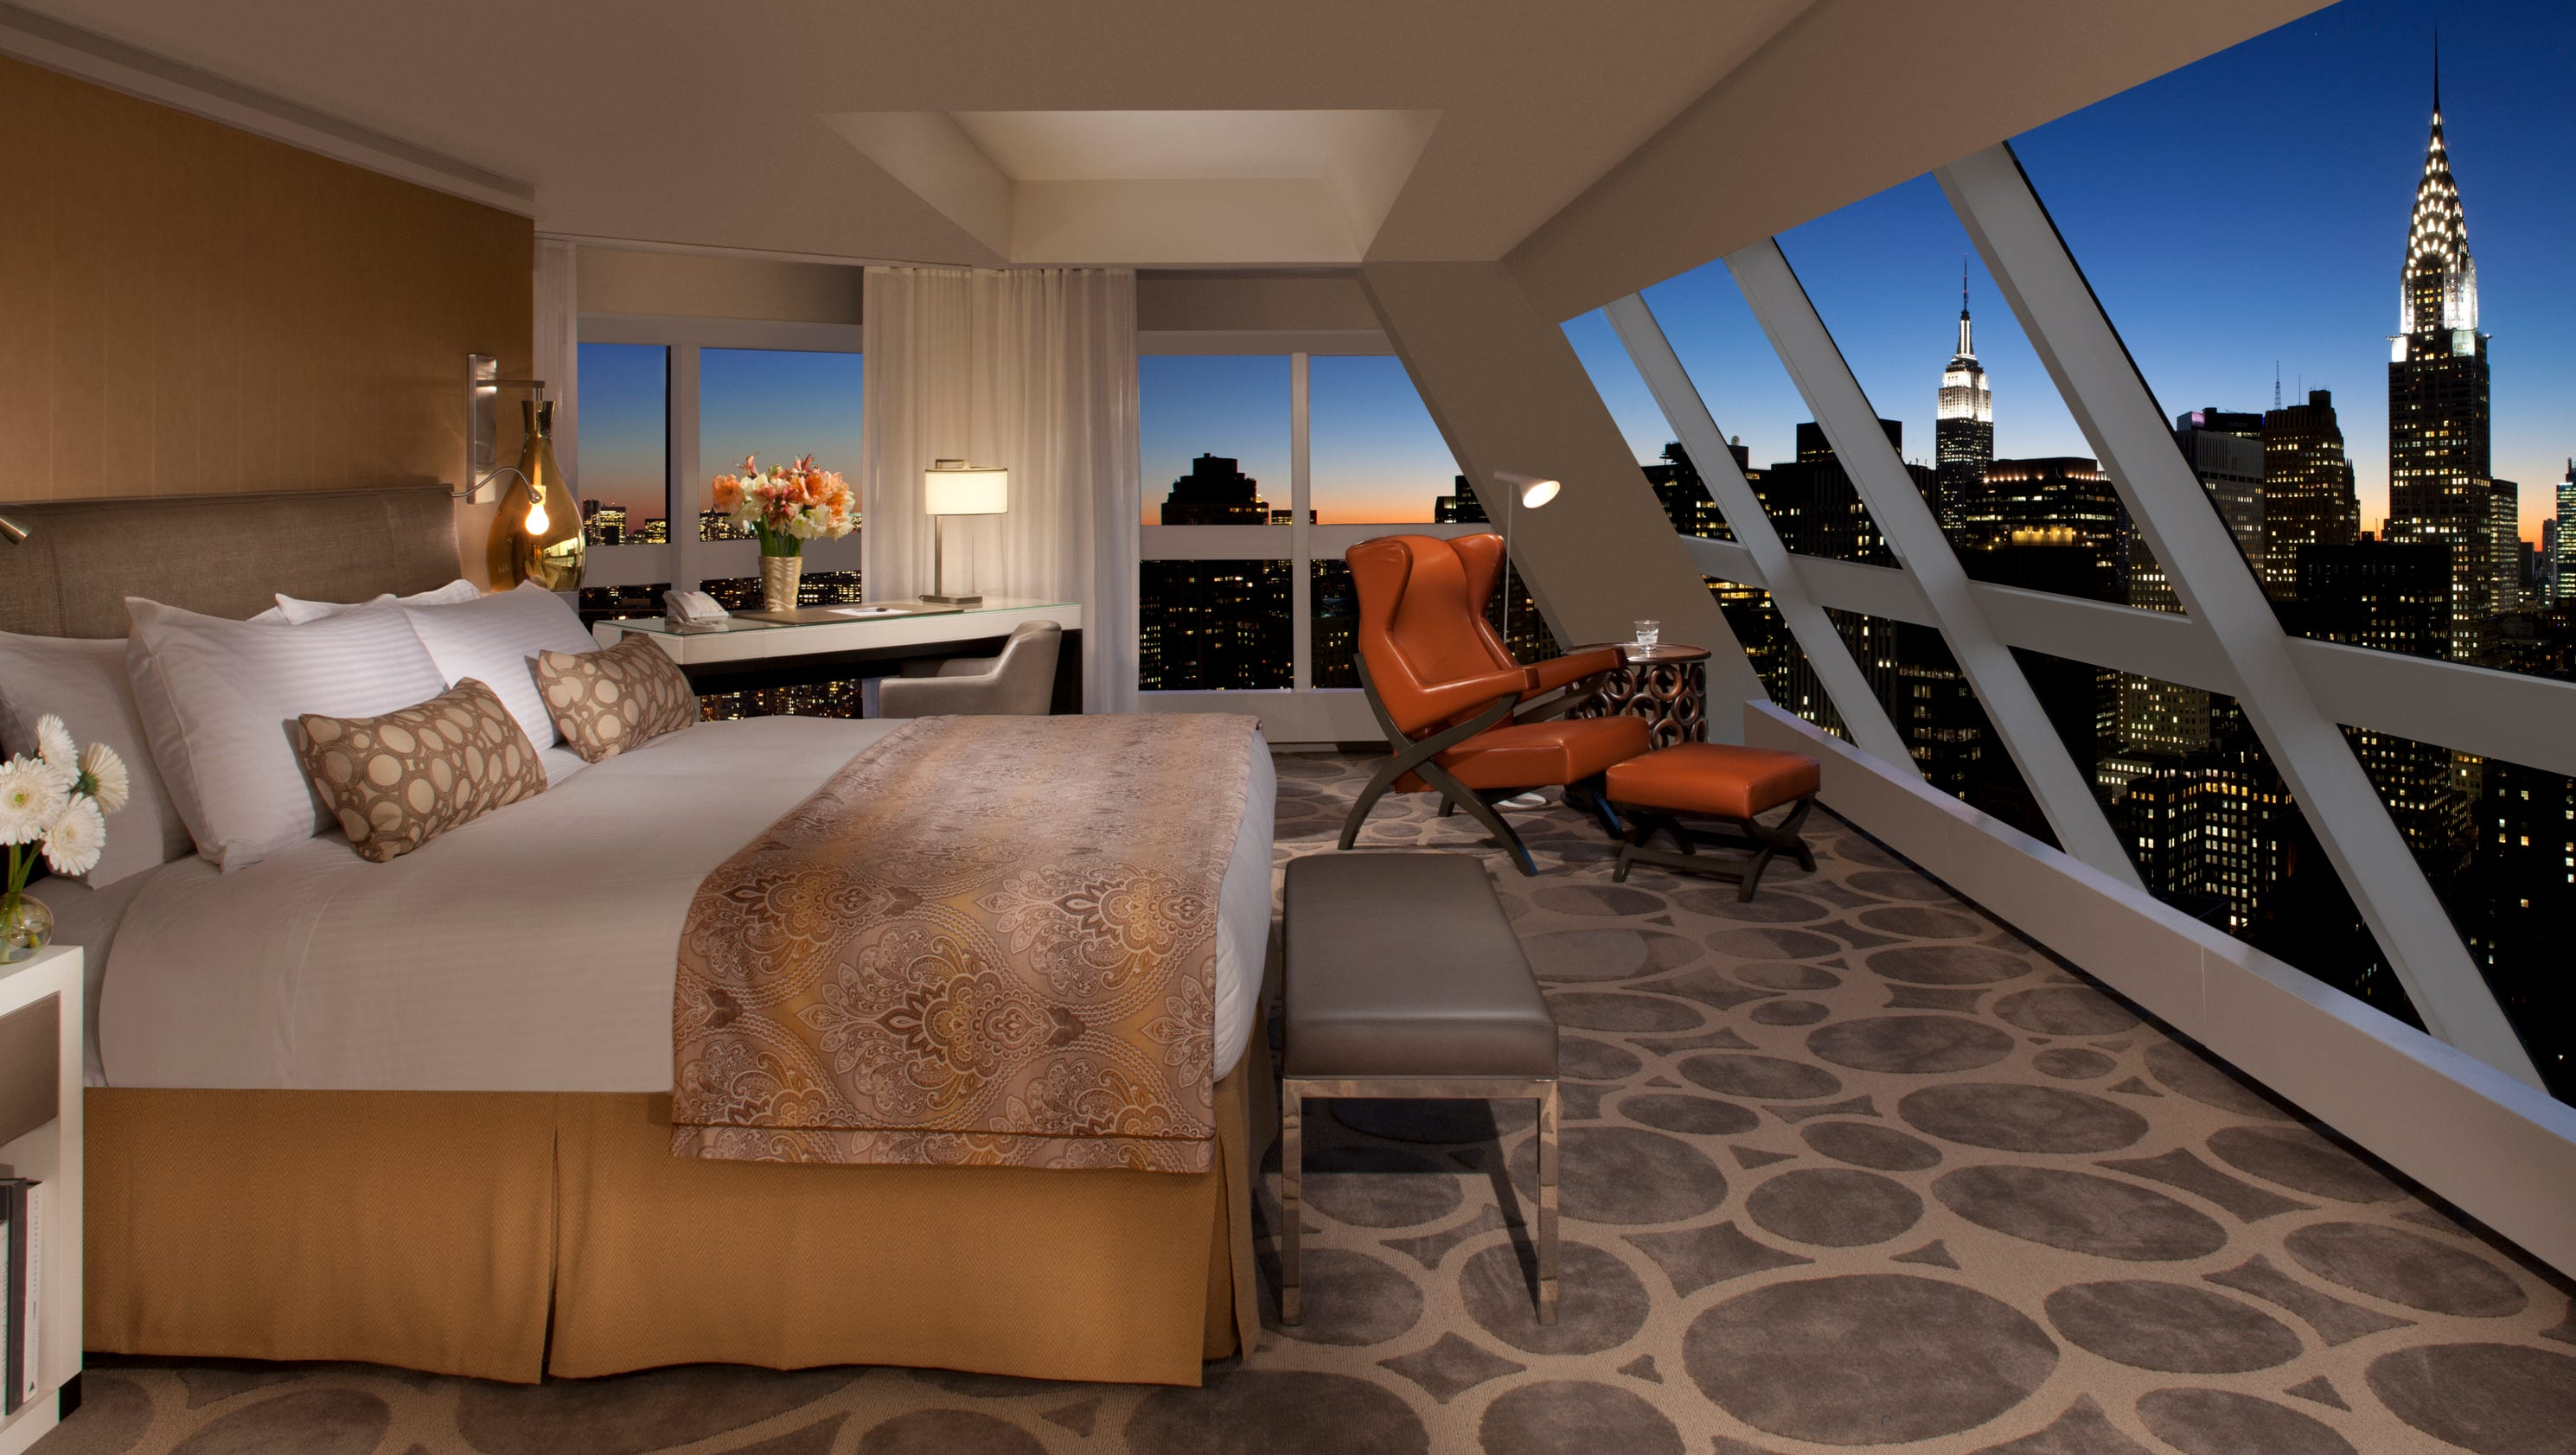 Duplex Rooms New York Hotels